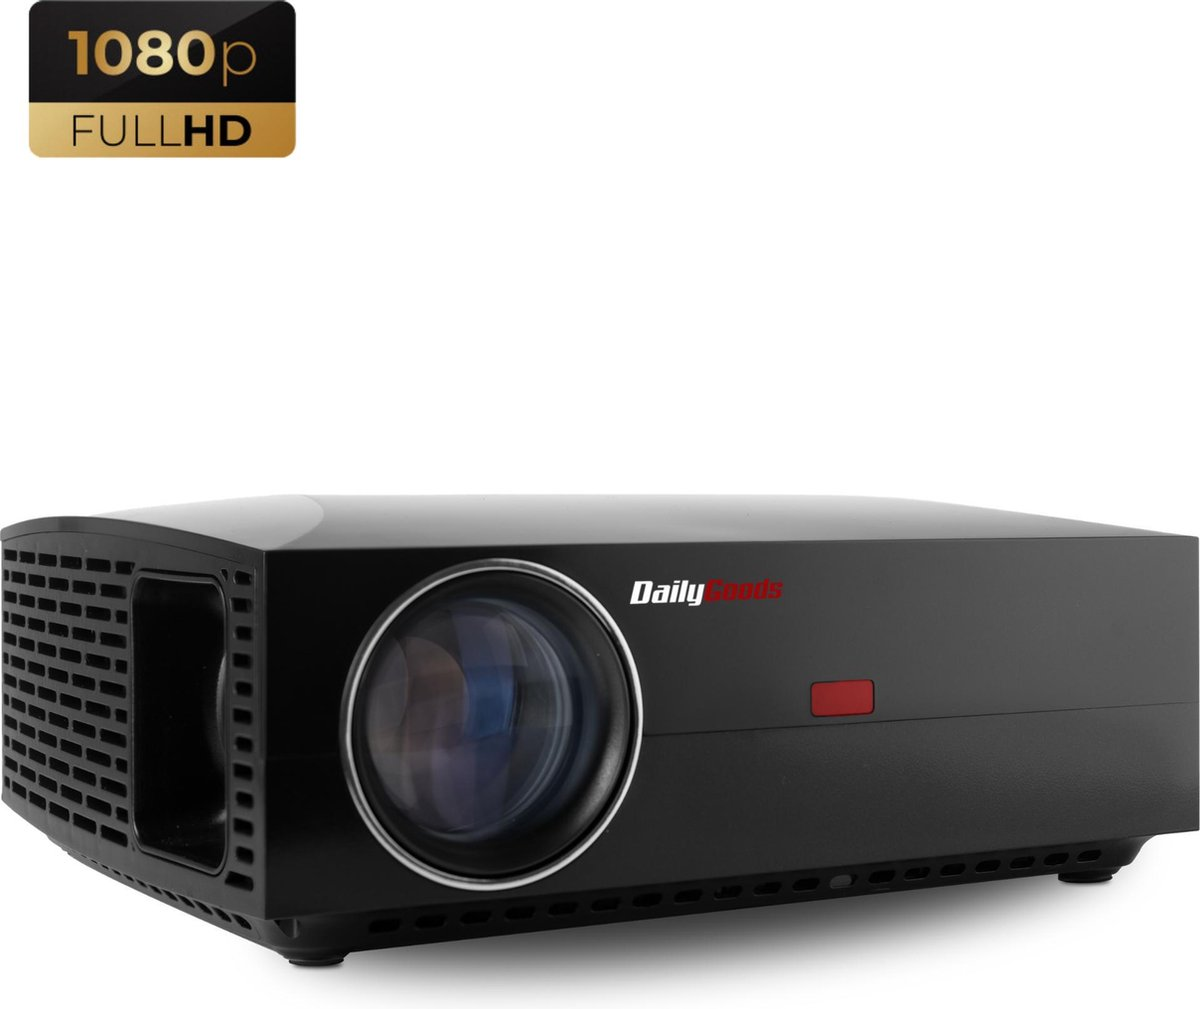 Dailygoods Beamer FU30 - Projector - 4200 Lumen - Full HD - Wifi